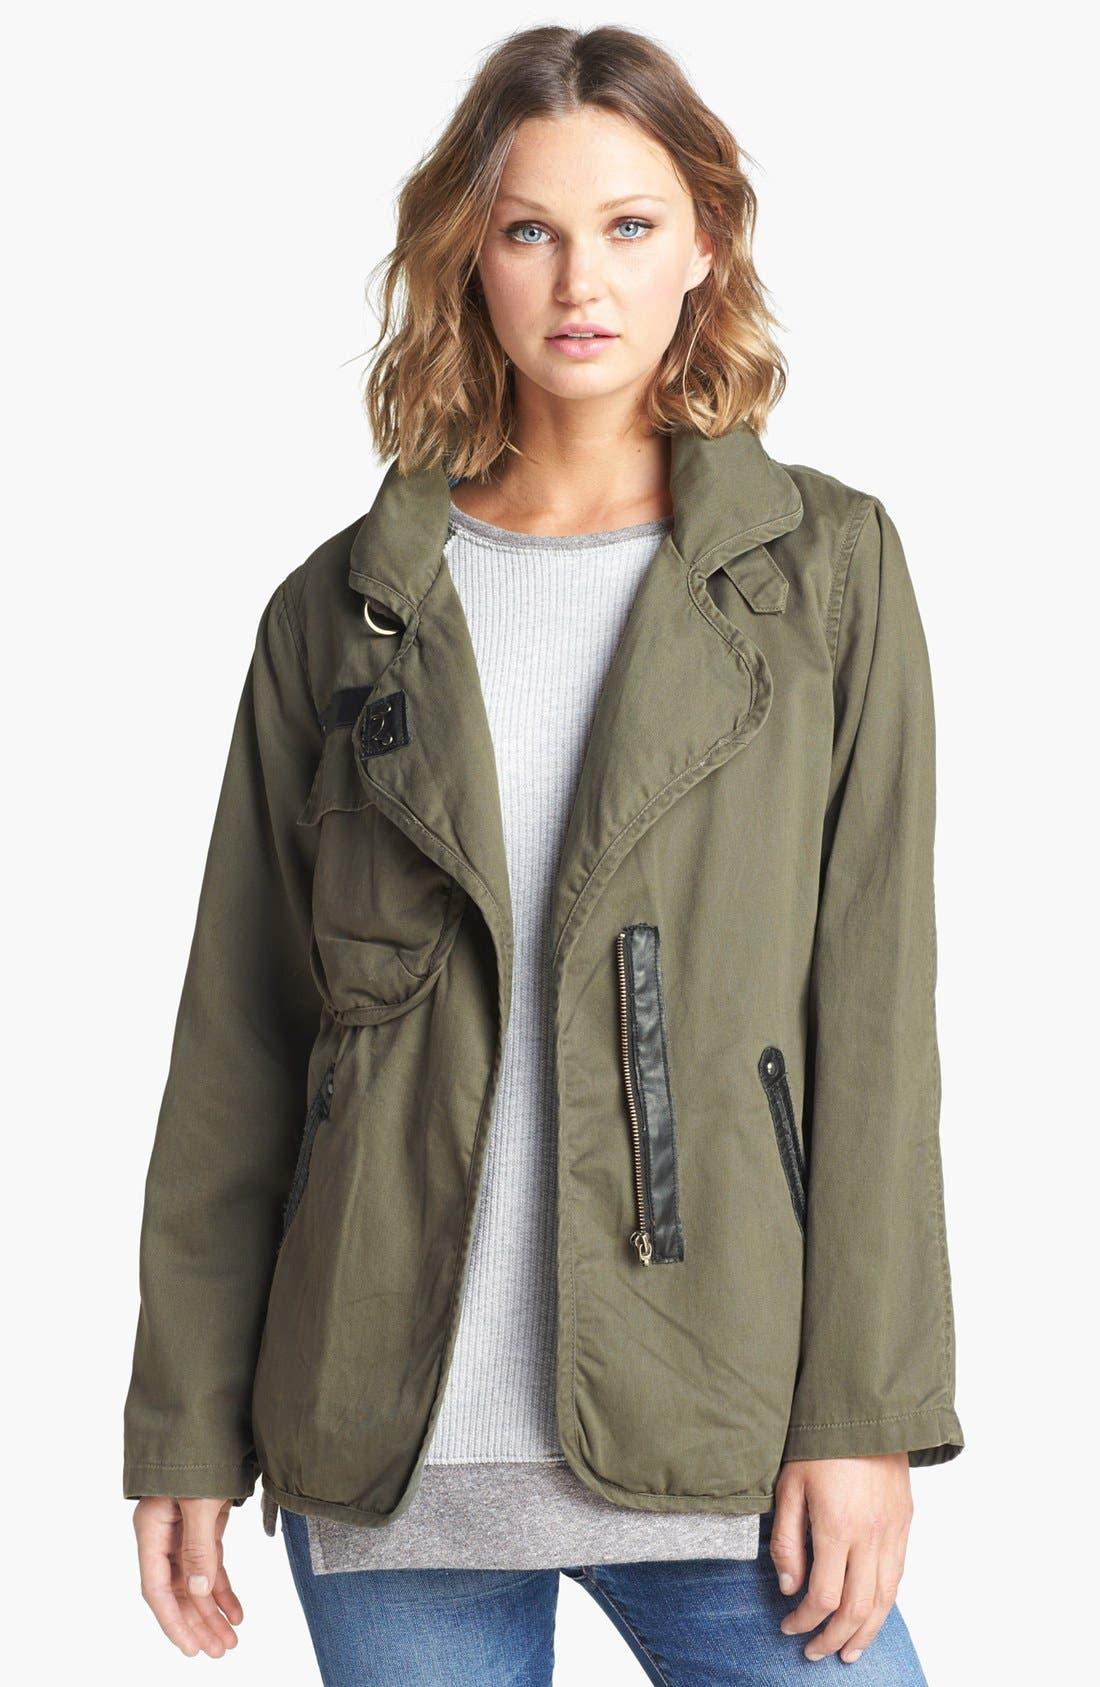 Alternate Image 1 Selected - Sanctuary Army Jacket